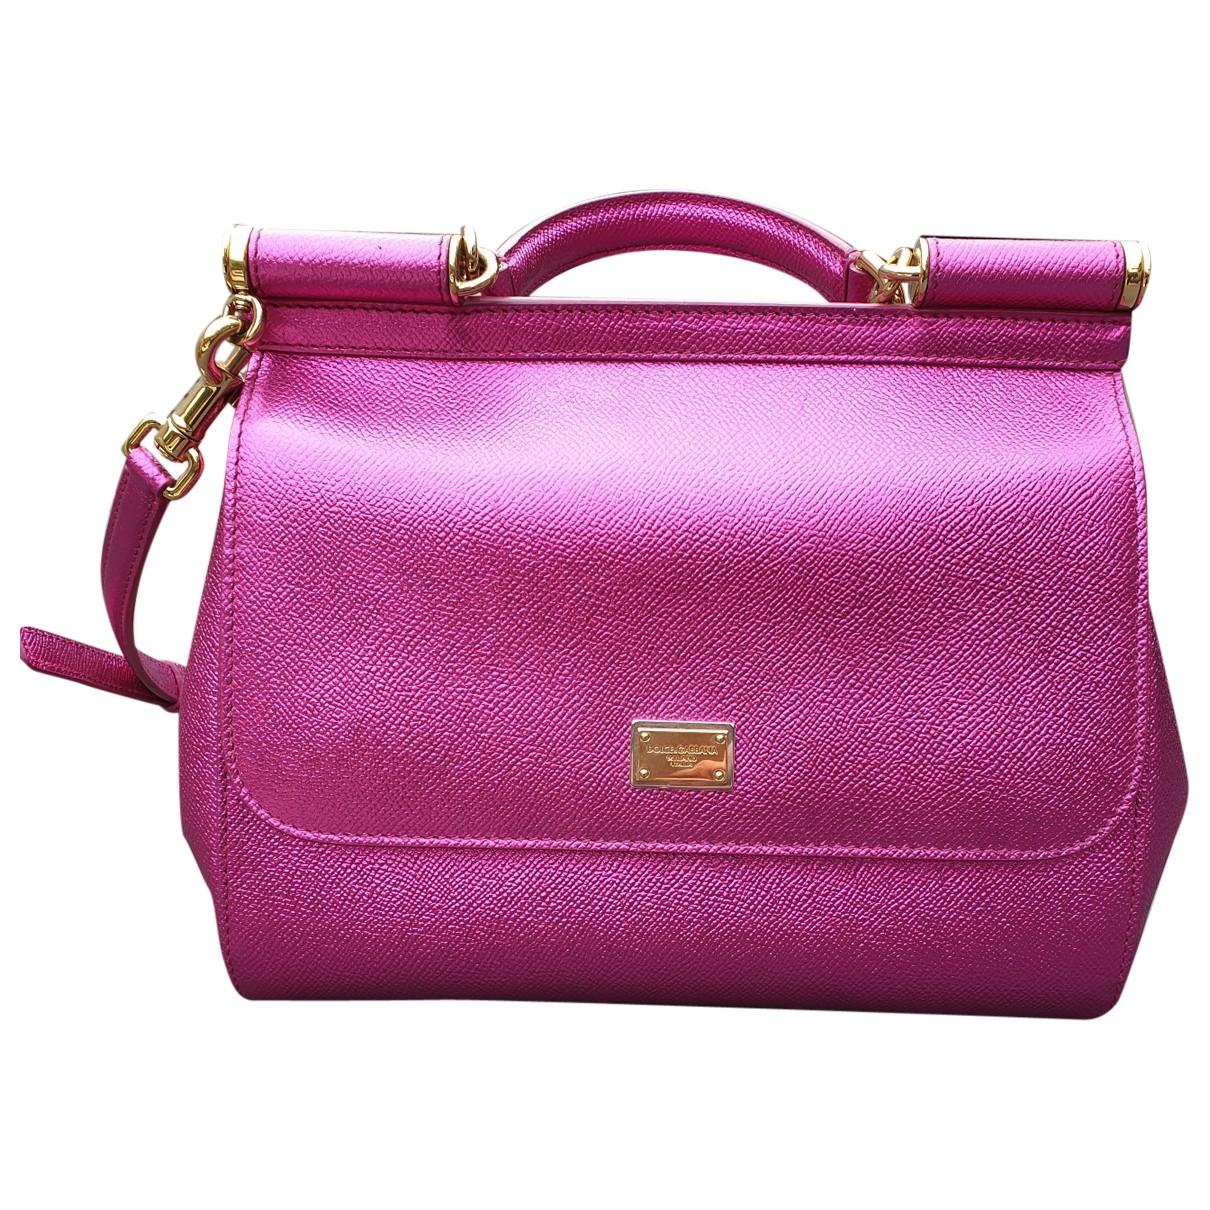 Dolce & Gabbana Sicily Metallic Leather handbag for Women \N